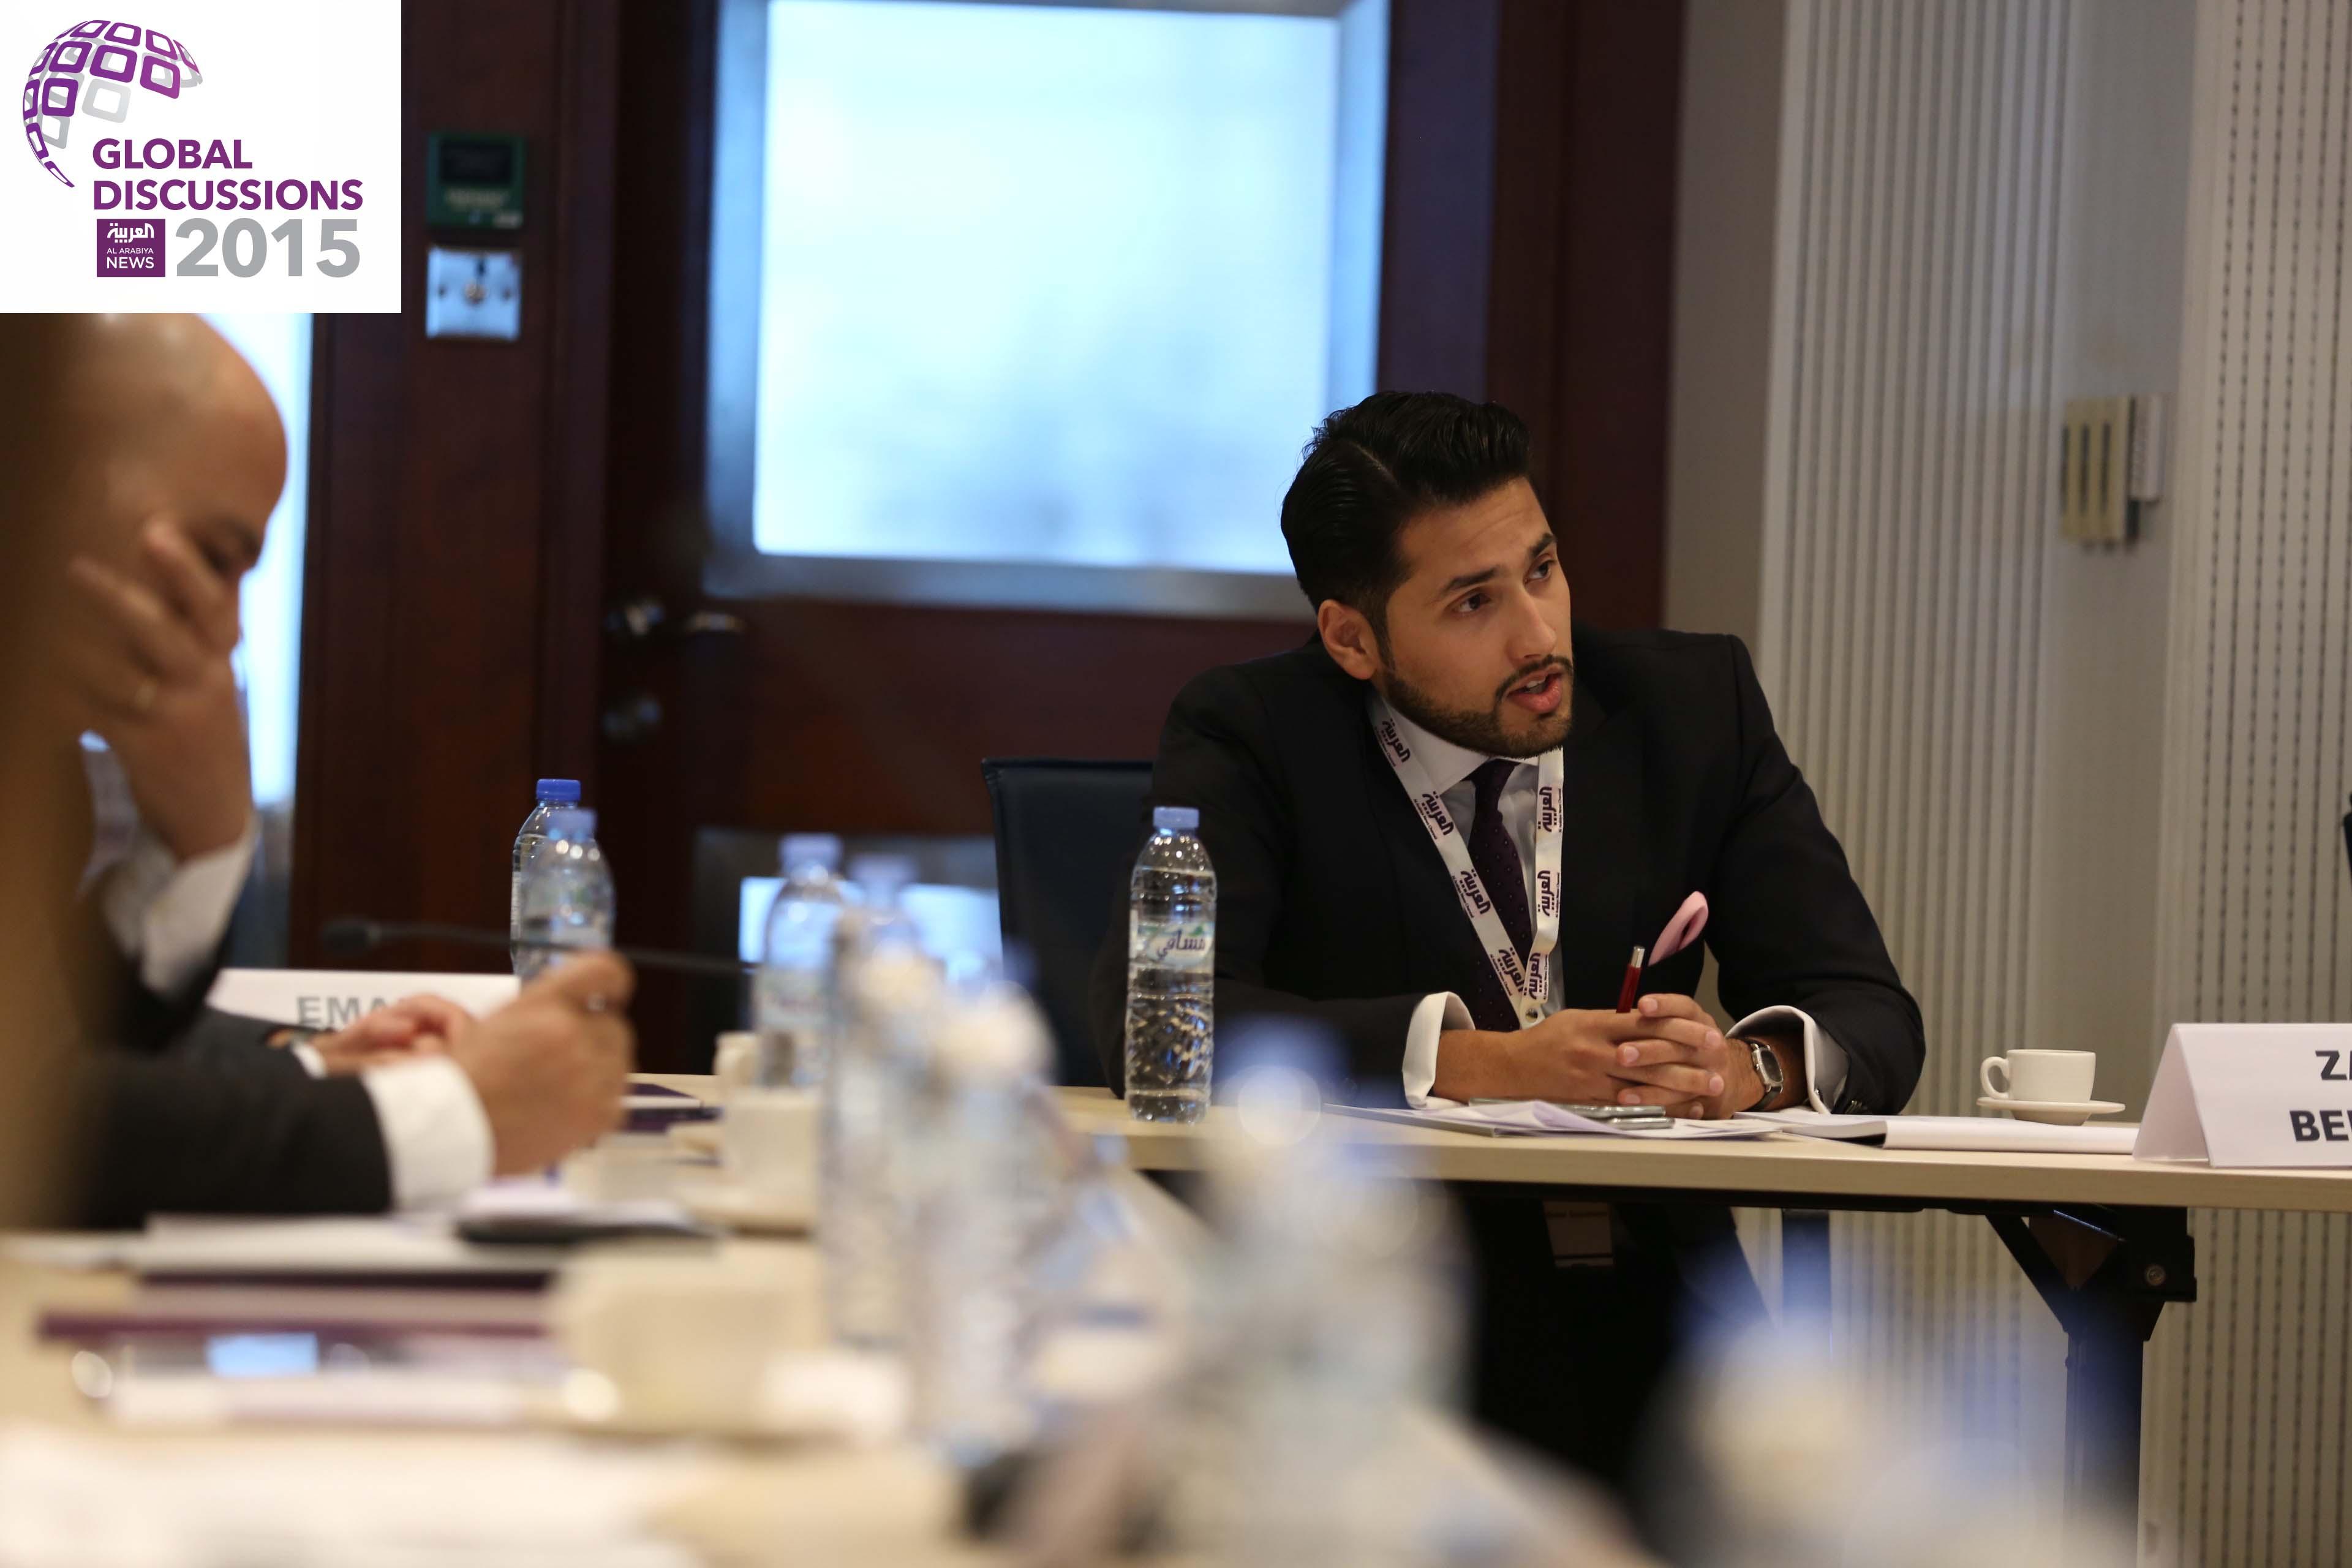 Day 1: Al Arabiya News Global Discussions 2015